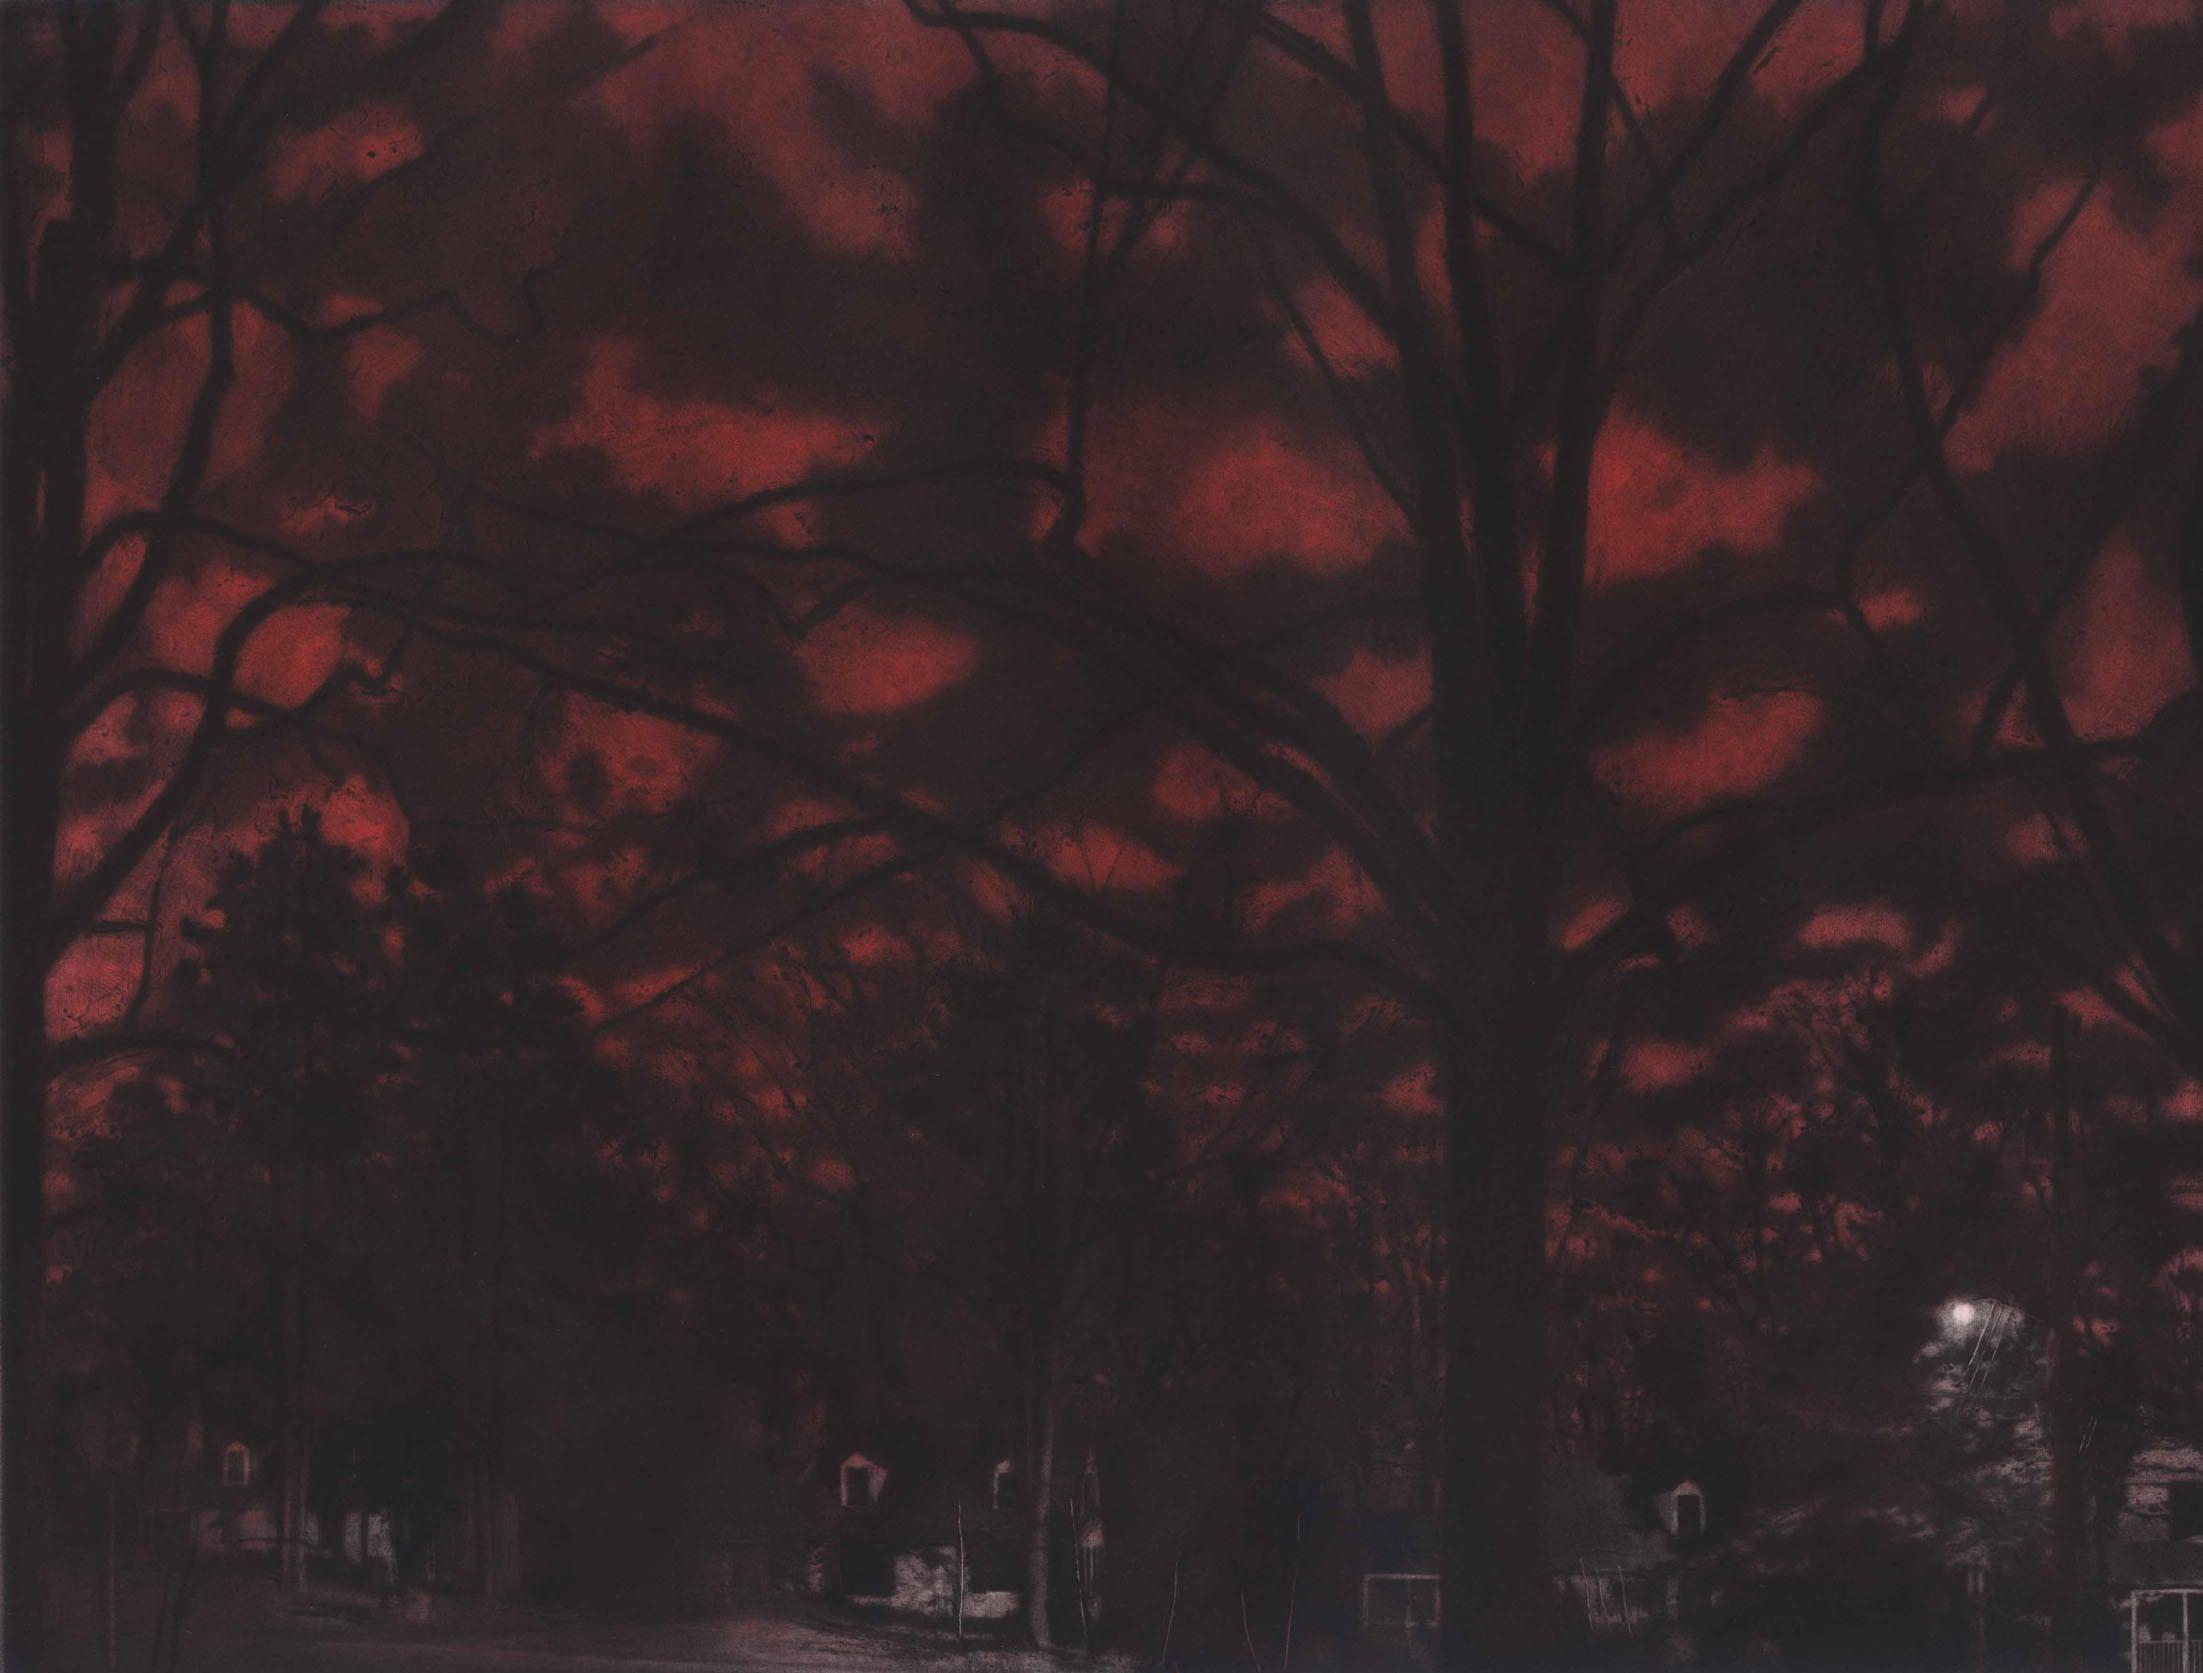 Night II image